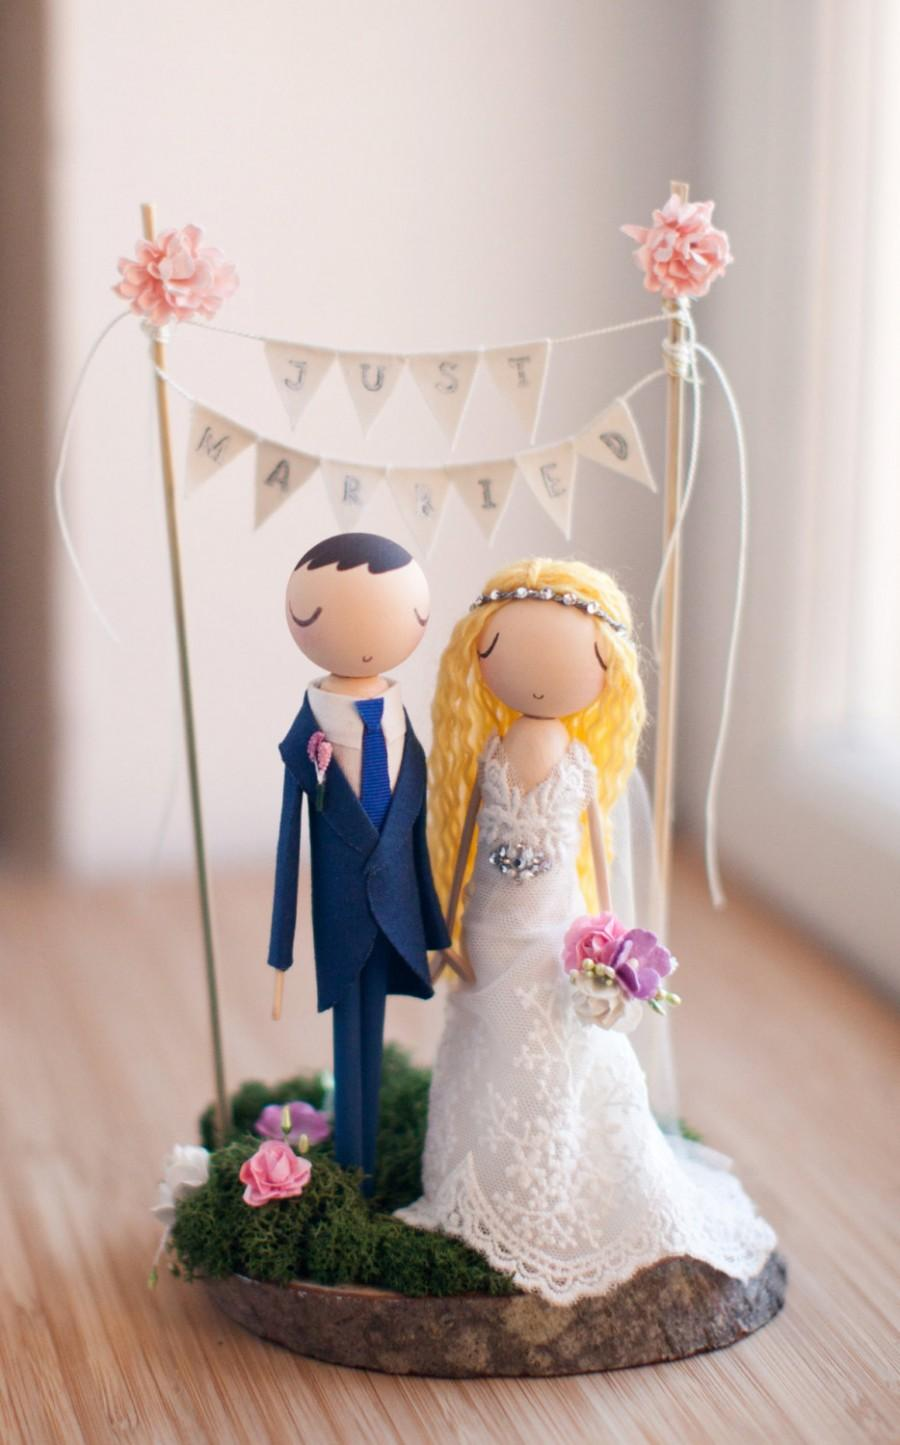 Hochzeit - Rustic Wedding Cake Topper, Boho Cake Topper, Boho Wedding, Wooden Topper,Wooden Peg Doll,Wedding Gift,Personalized,Boho wedding cake topper